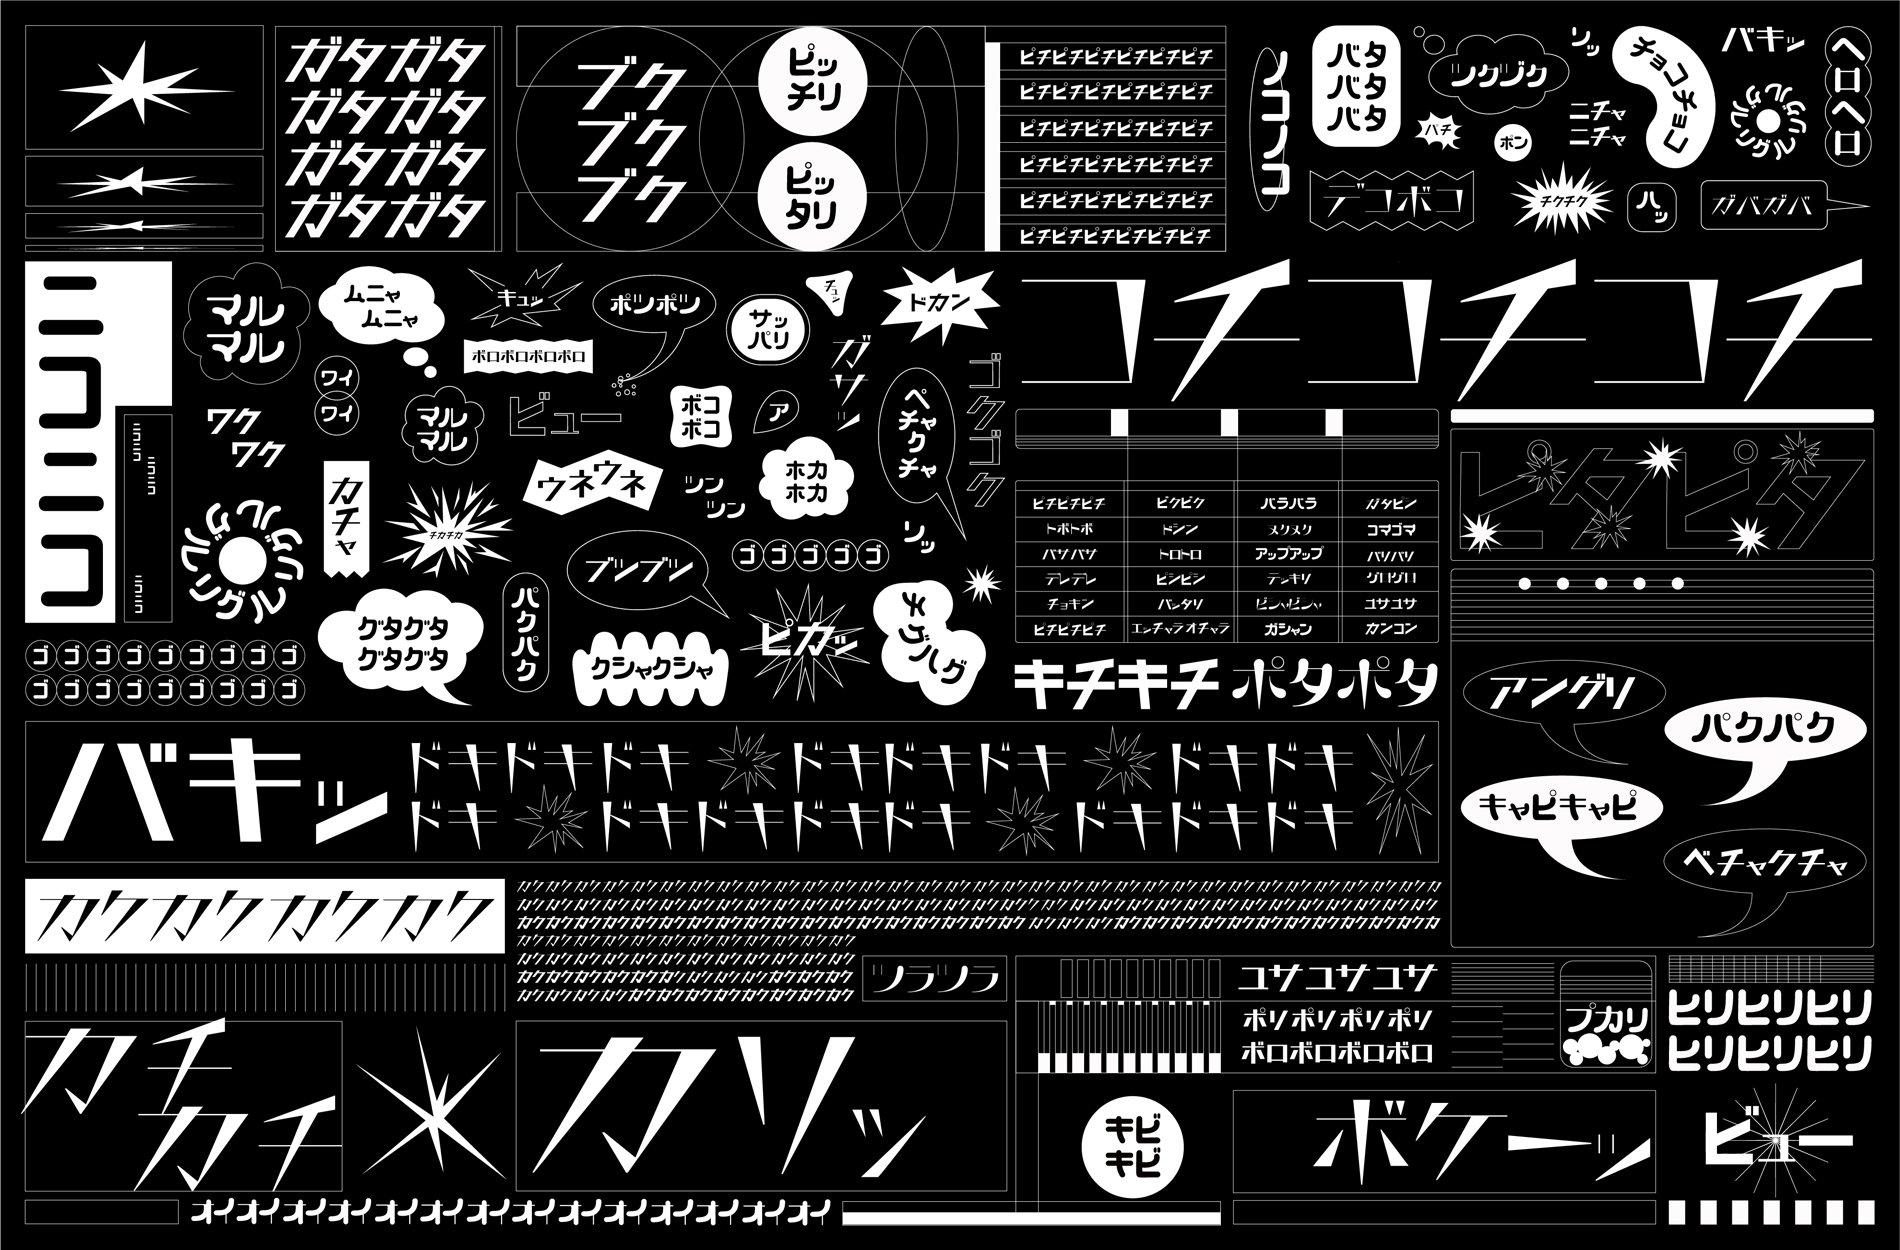 Emi Takahashi 1.jpg